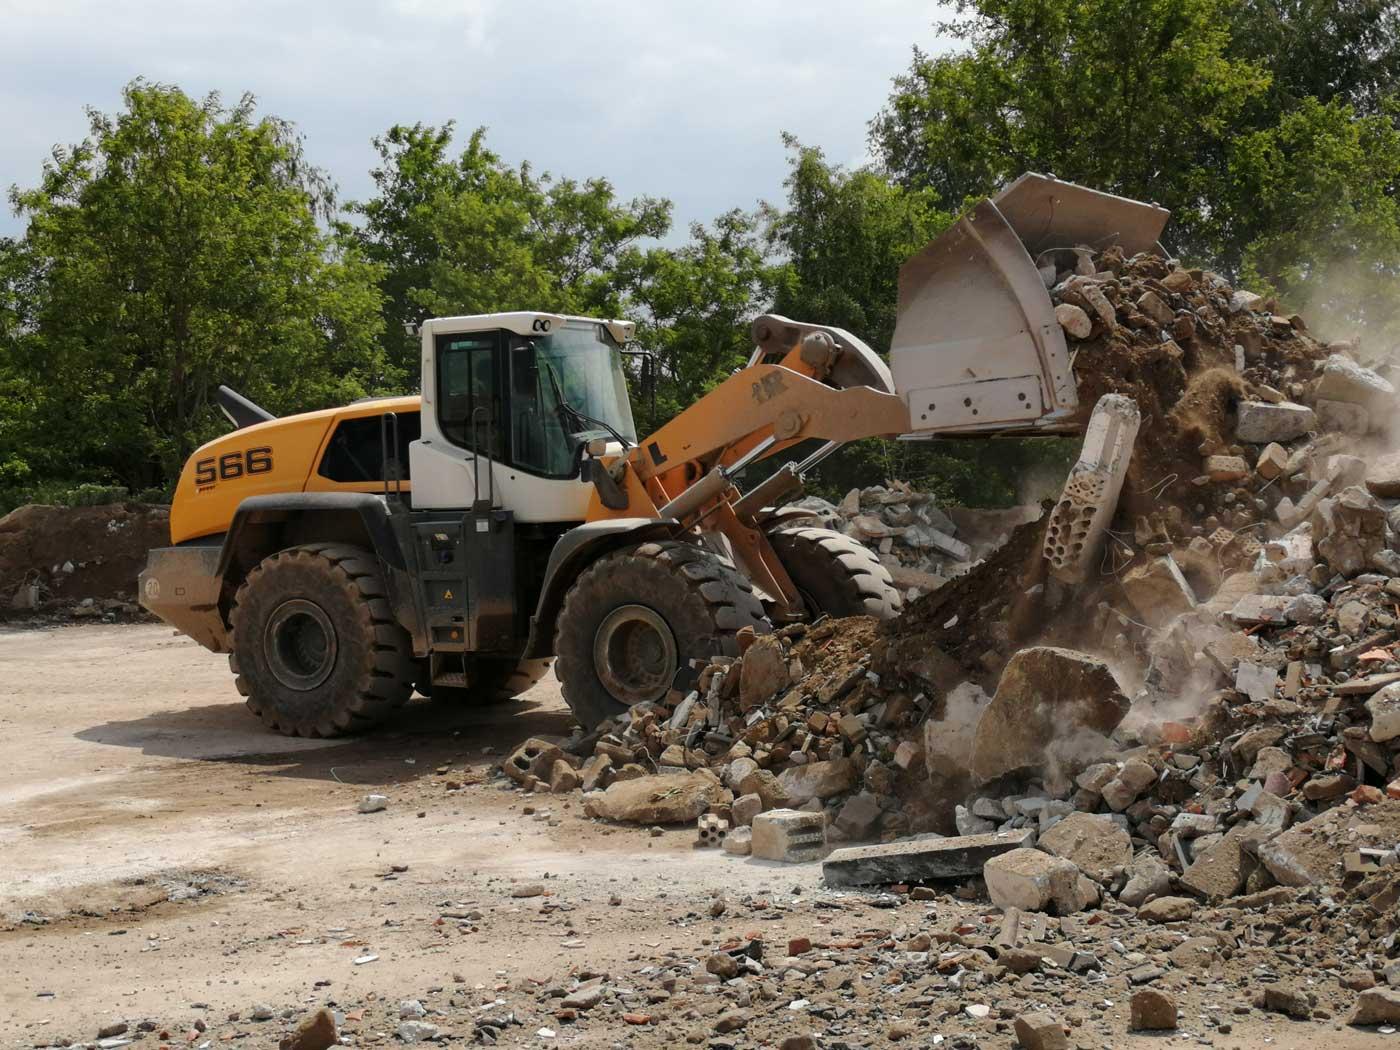 Baustoff Recycling Aushubdeponie Beton2go